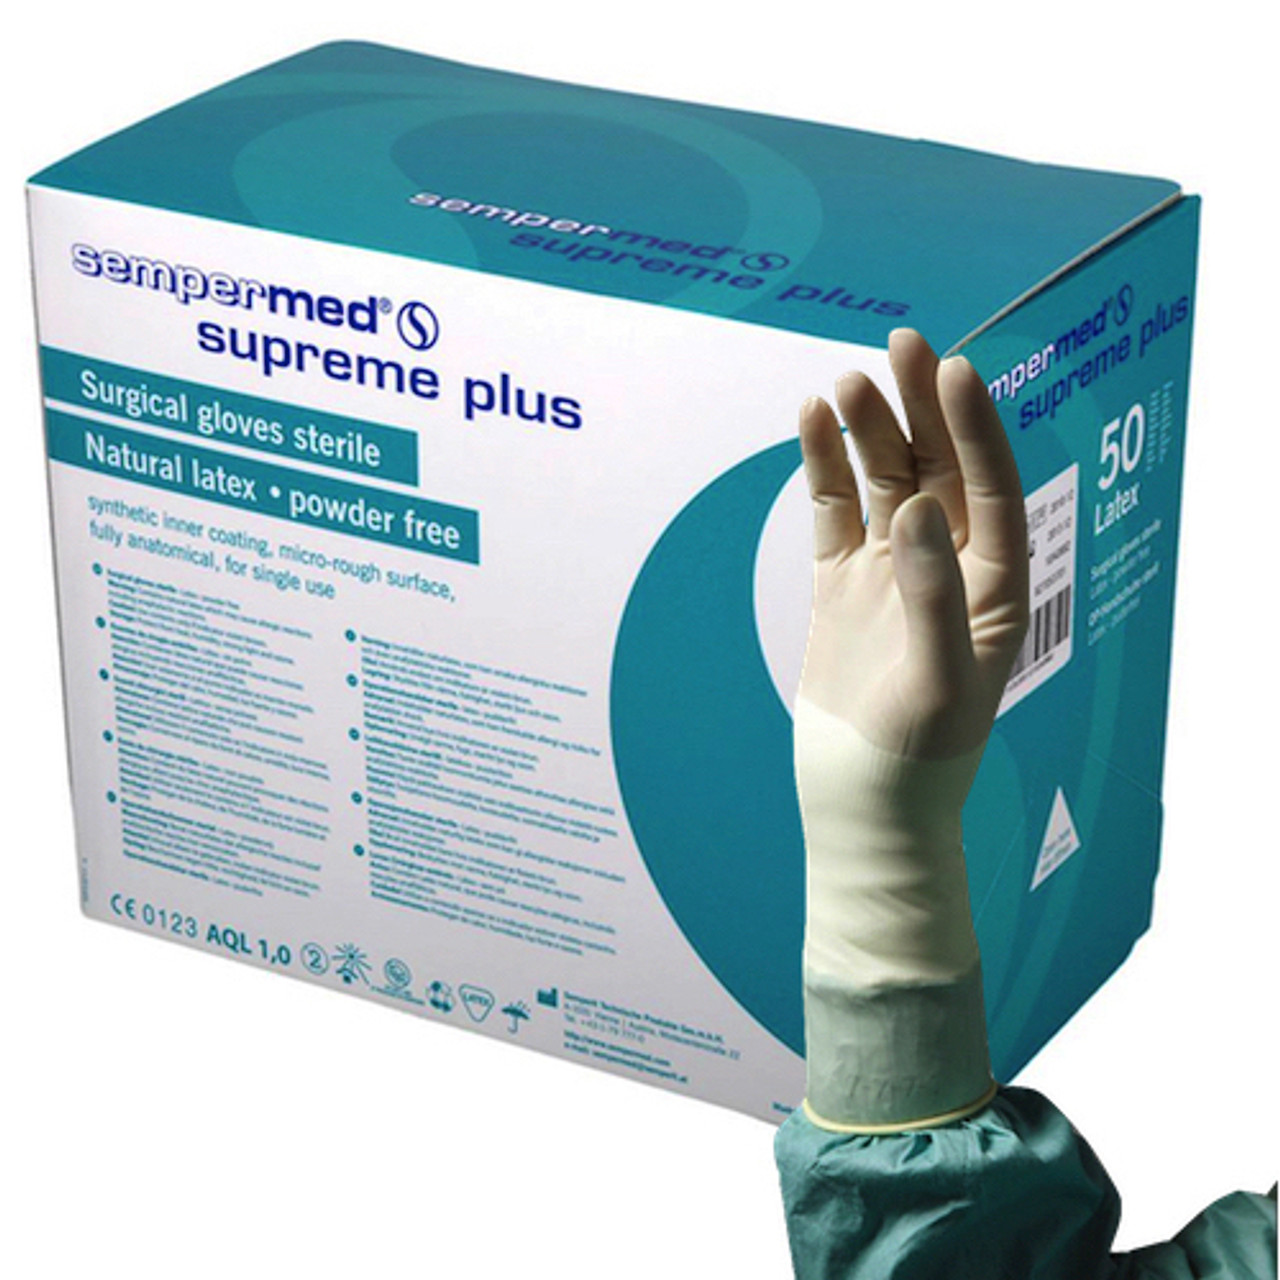 Sempermed Supreme Plus Surgical Gloves Sterile 8 1/2 Latex Powder Free (SUS822851G)